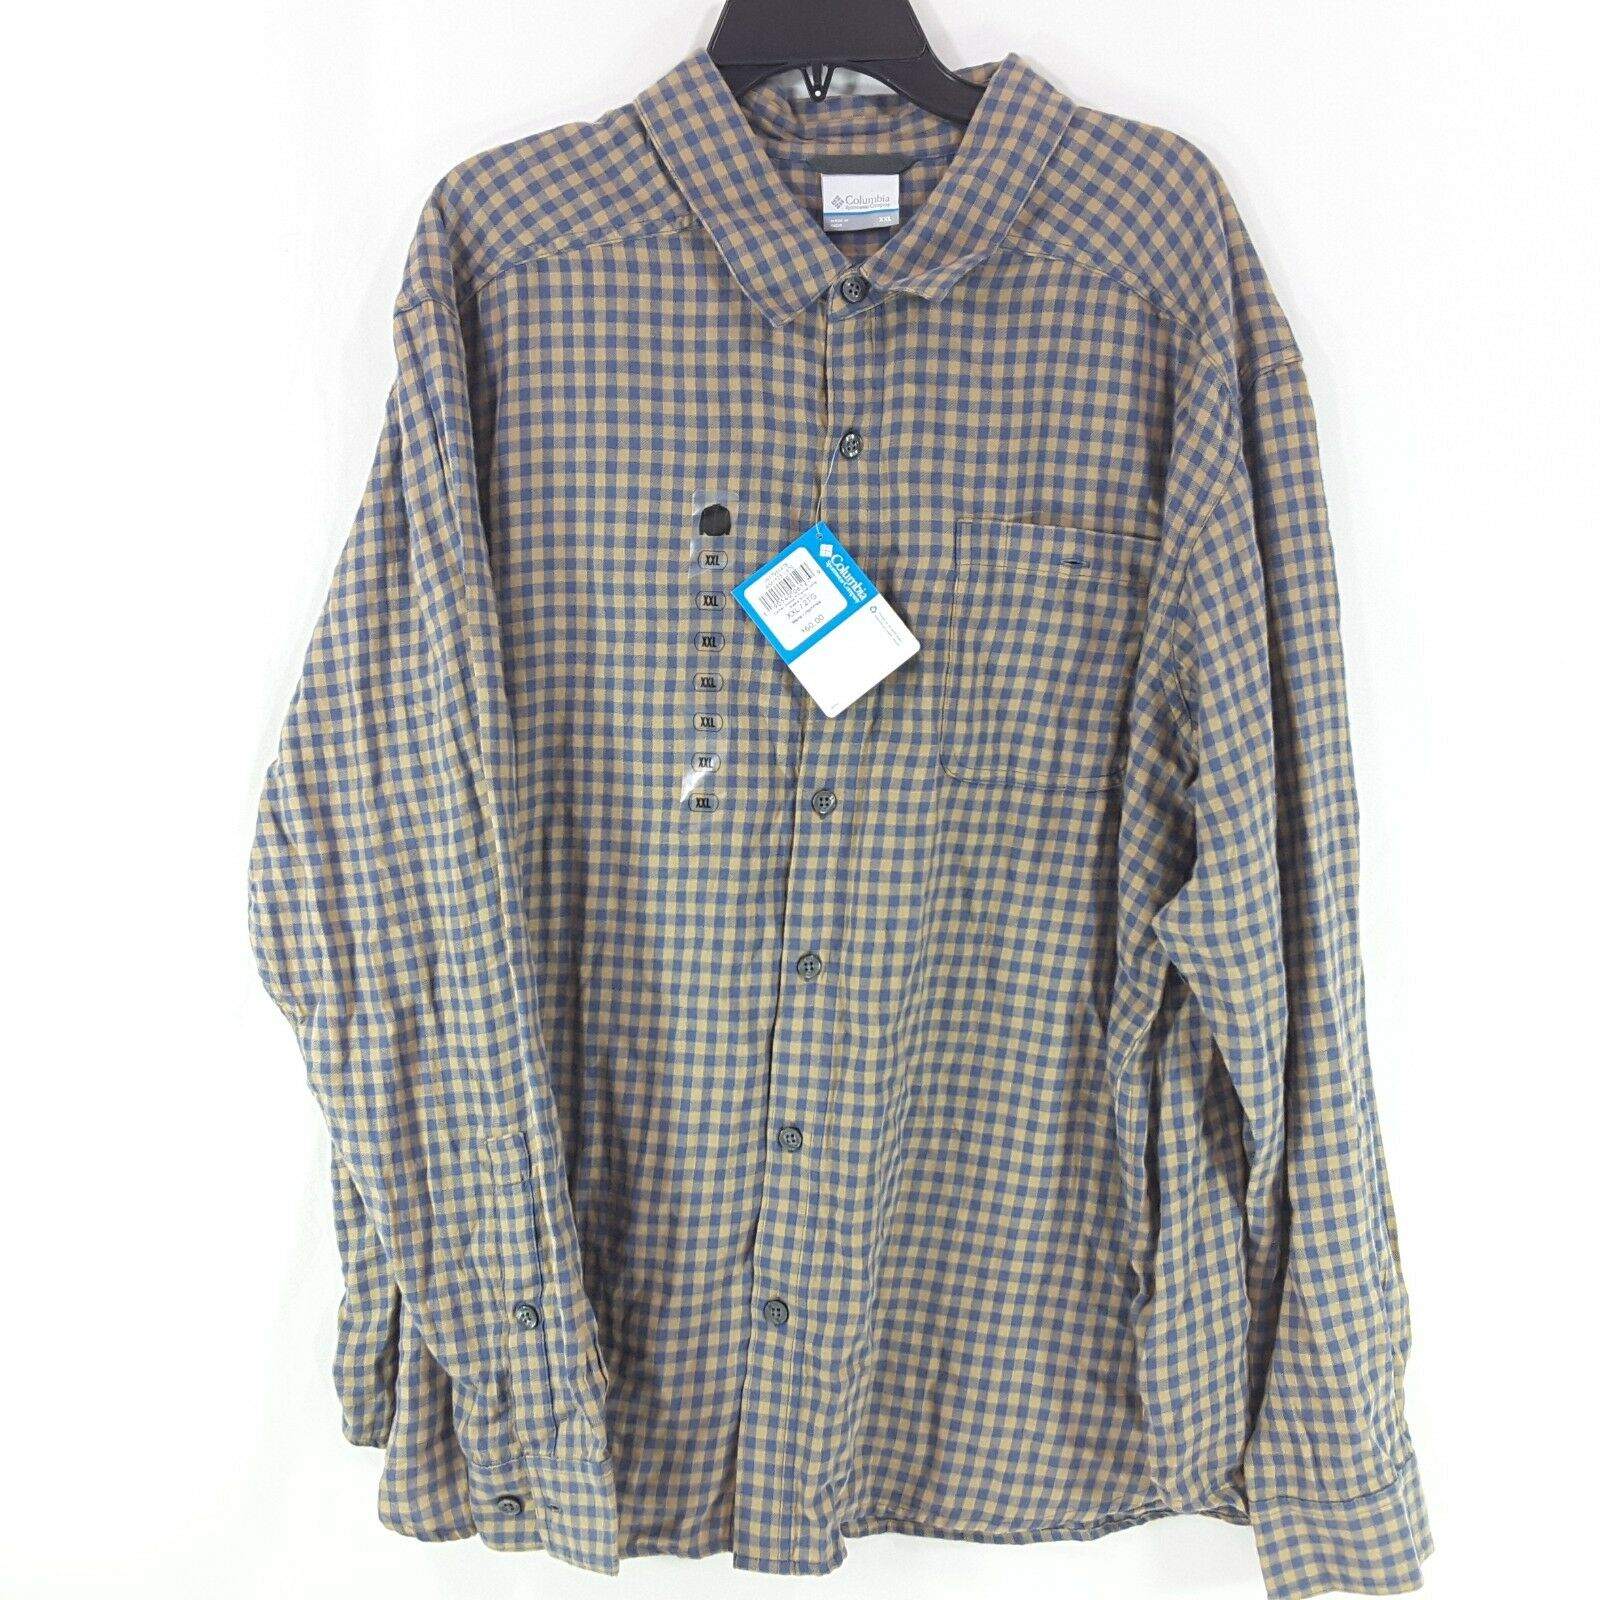 NEW Columbia Mens Shirt 2XL bluee Cornell Woods Flannel Long Sleeve Sportswear